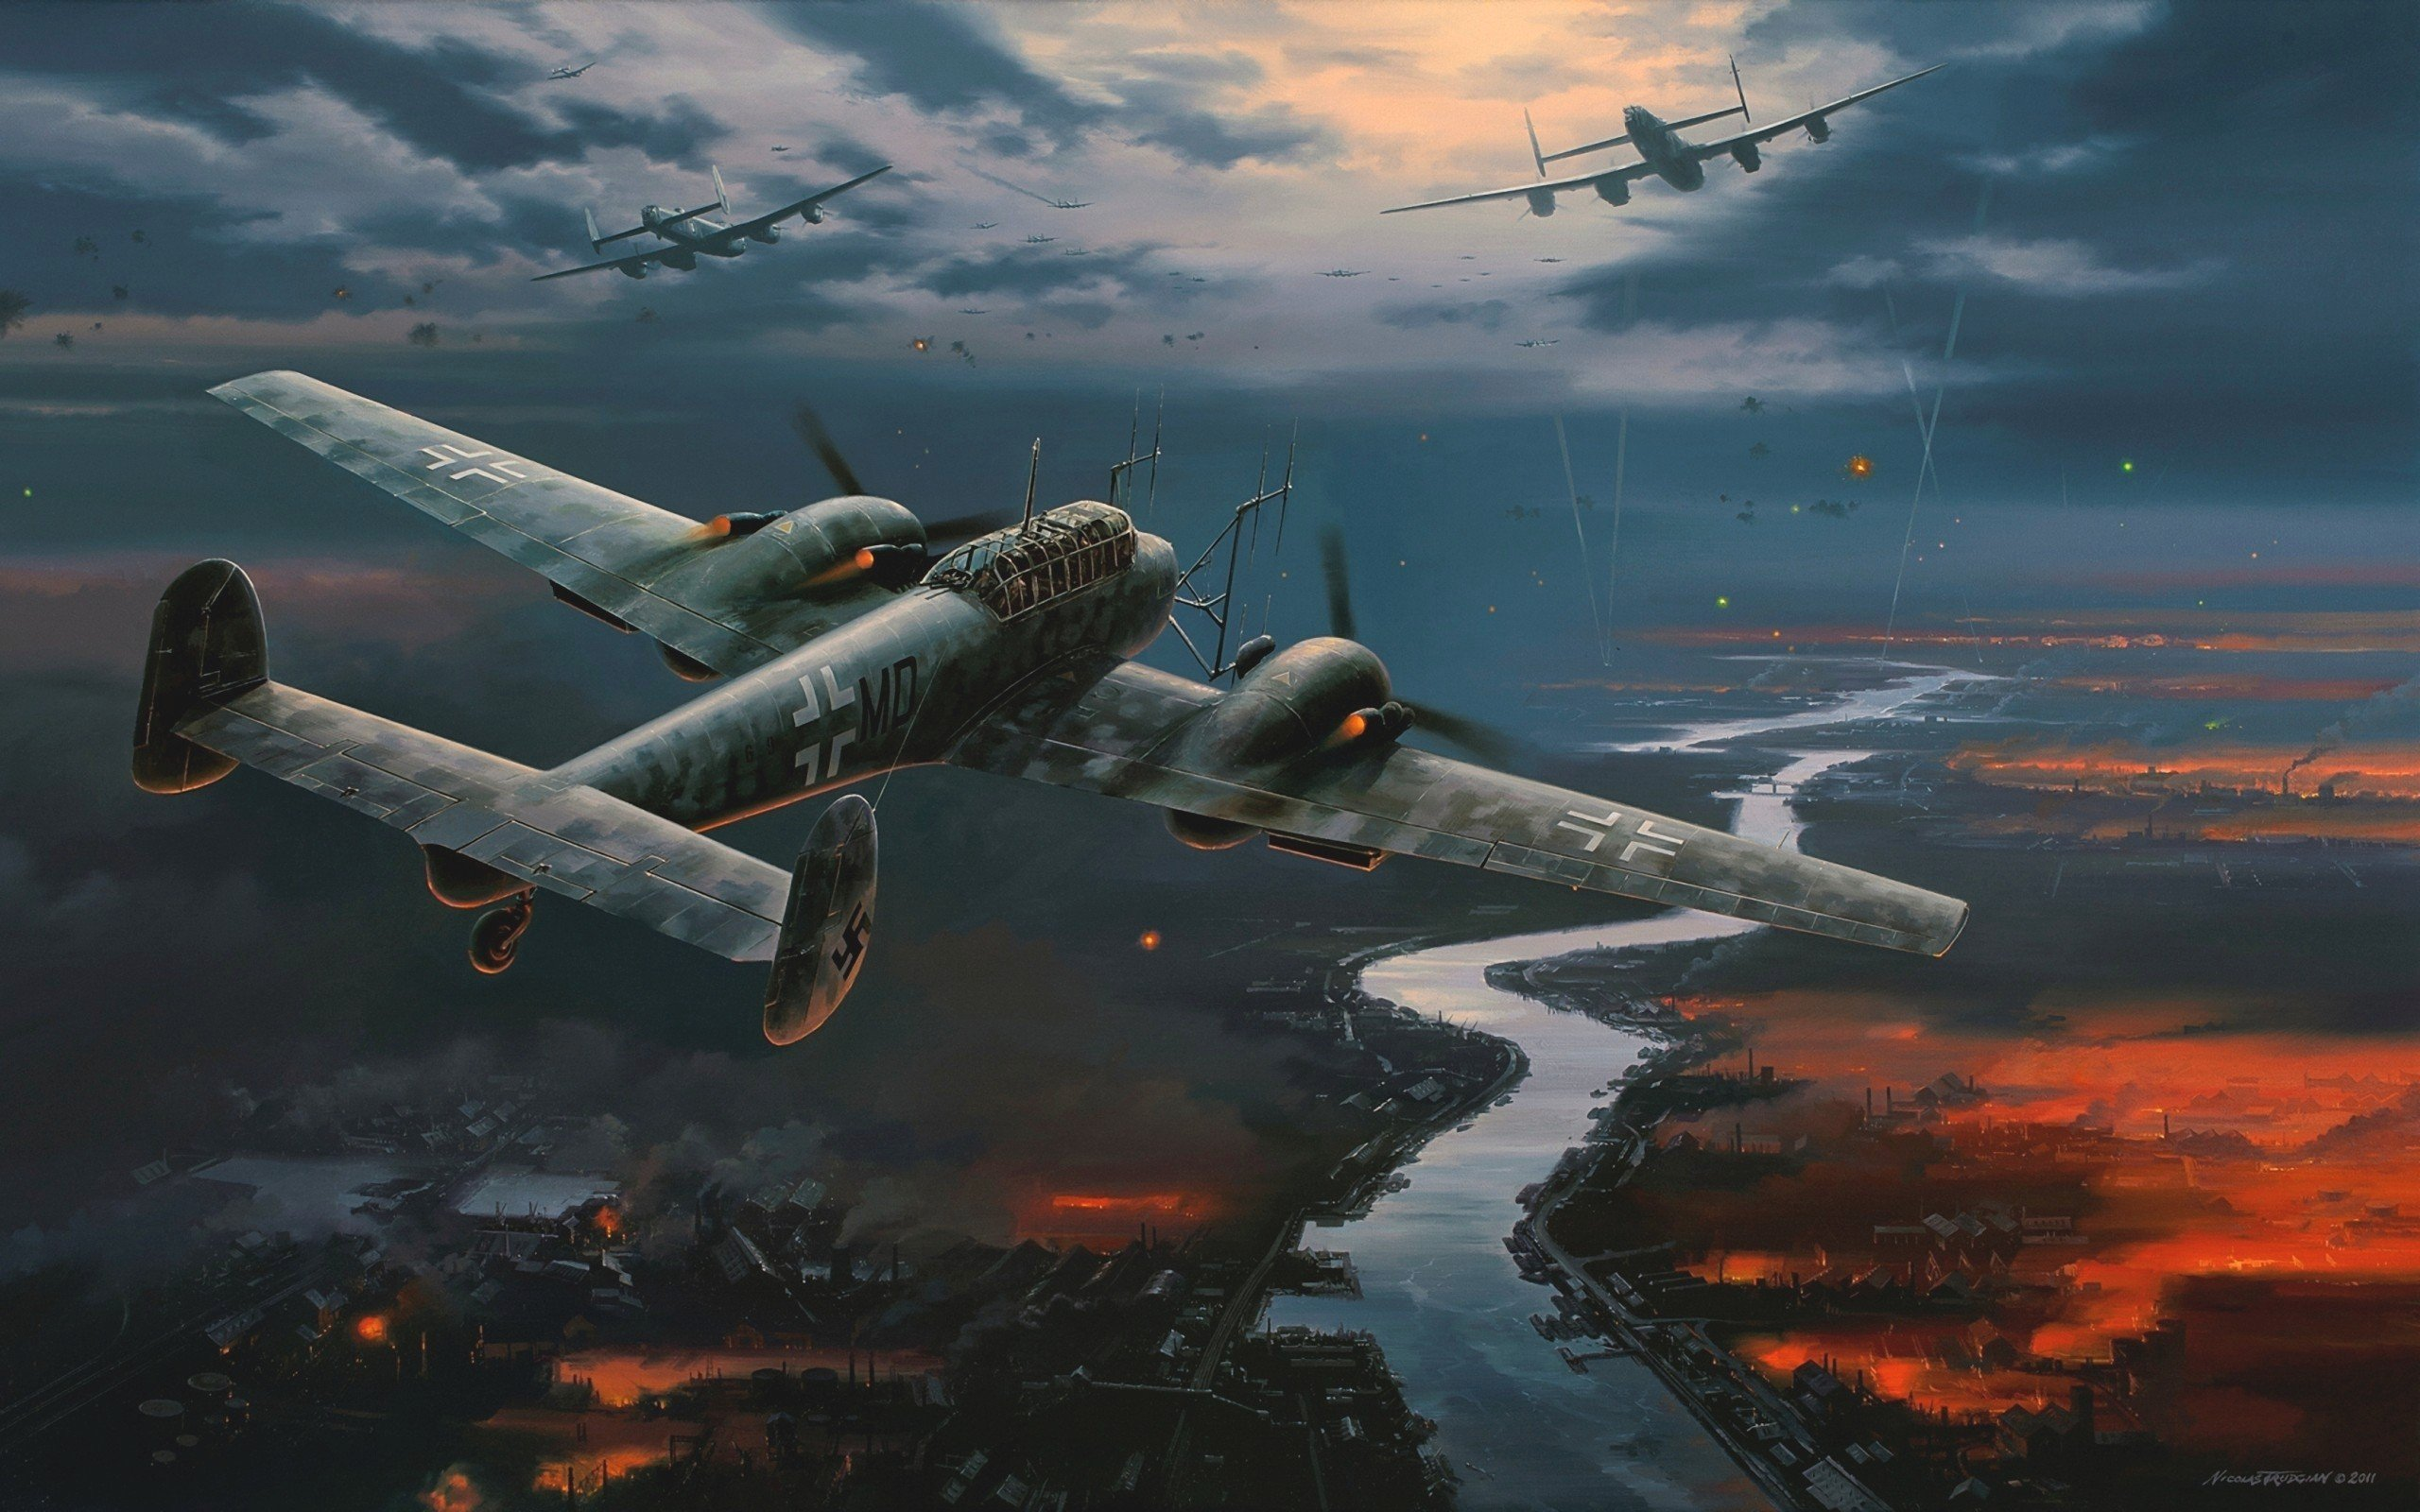 74 Luftwaffe Wallpaper On Wallpapersafari